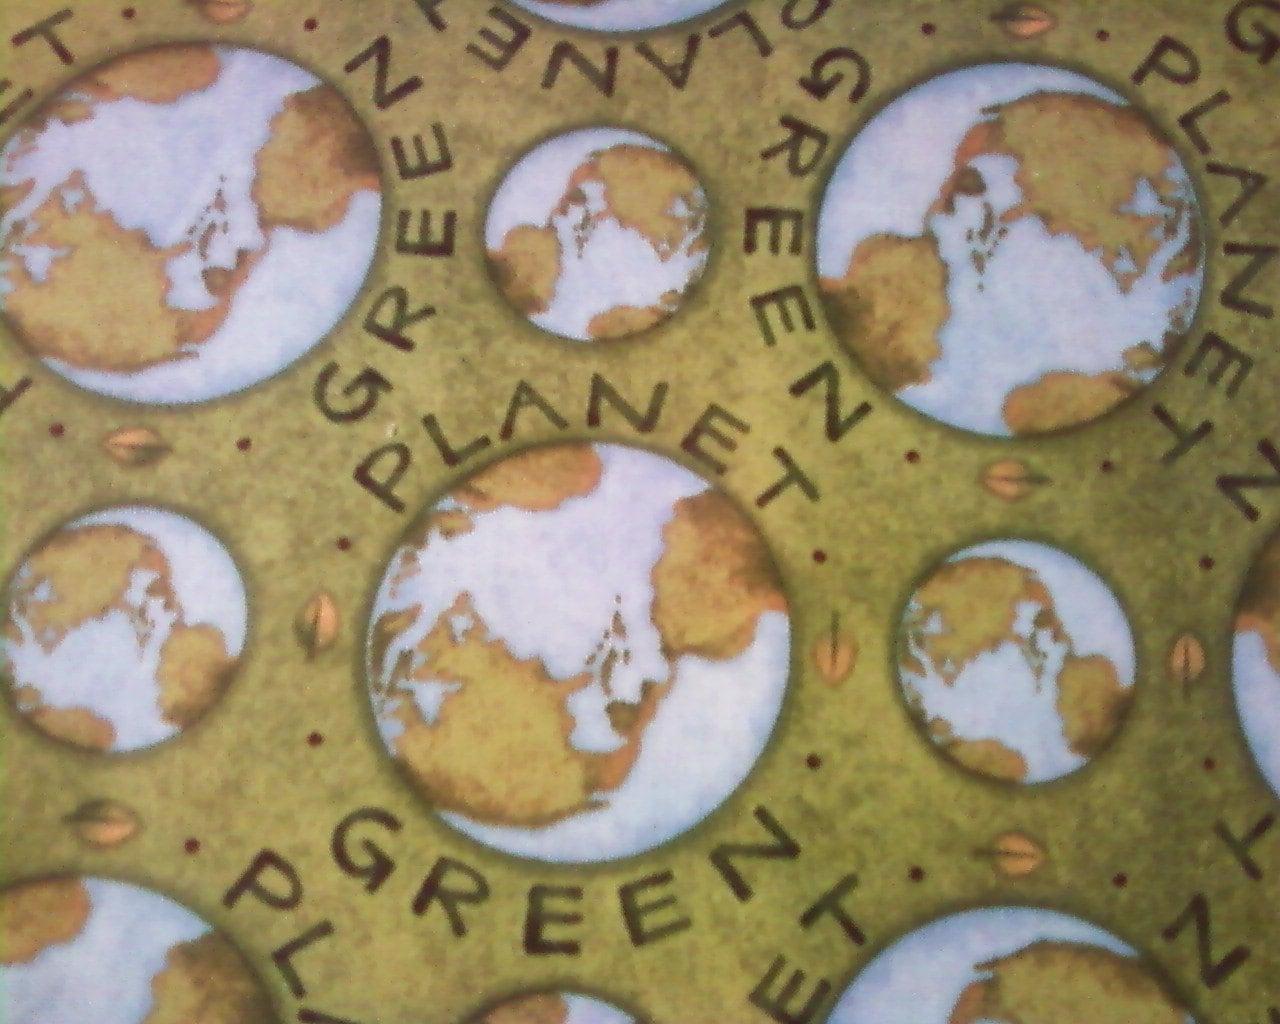 Debbie mumm green planet earth fabric for Fabric planet